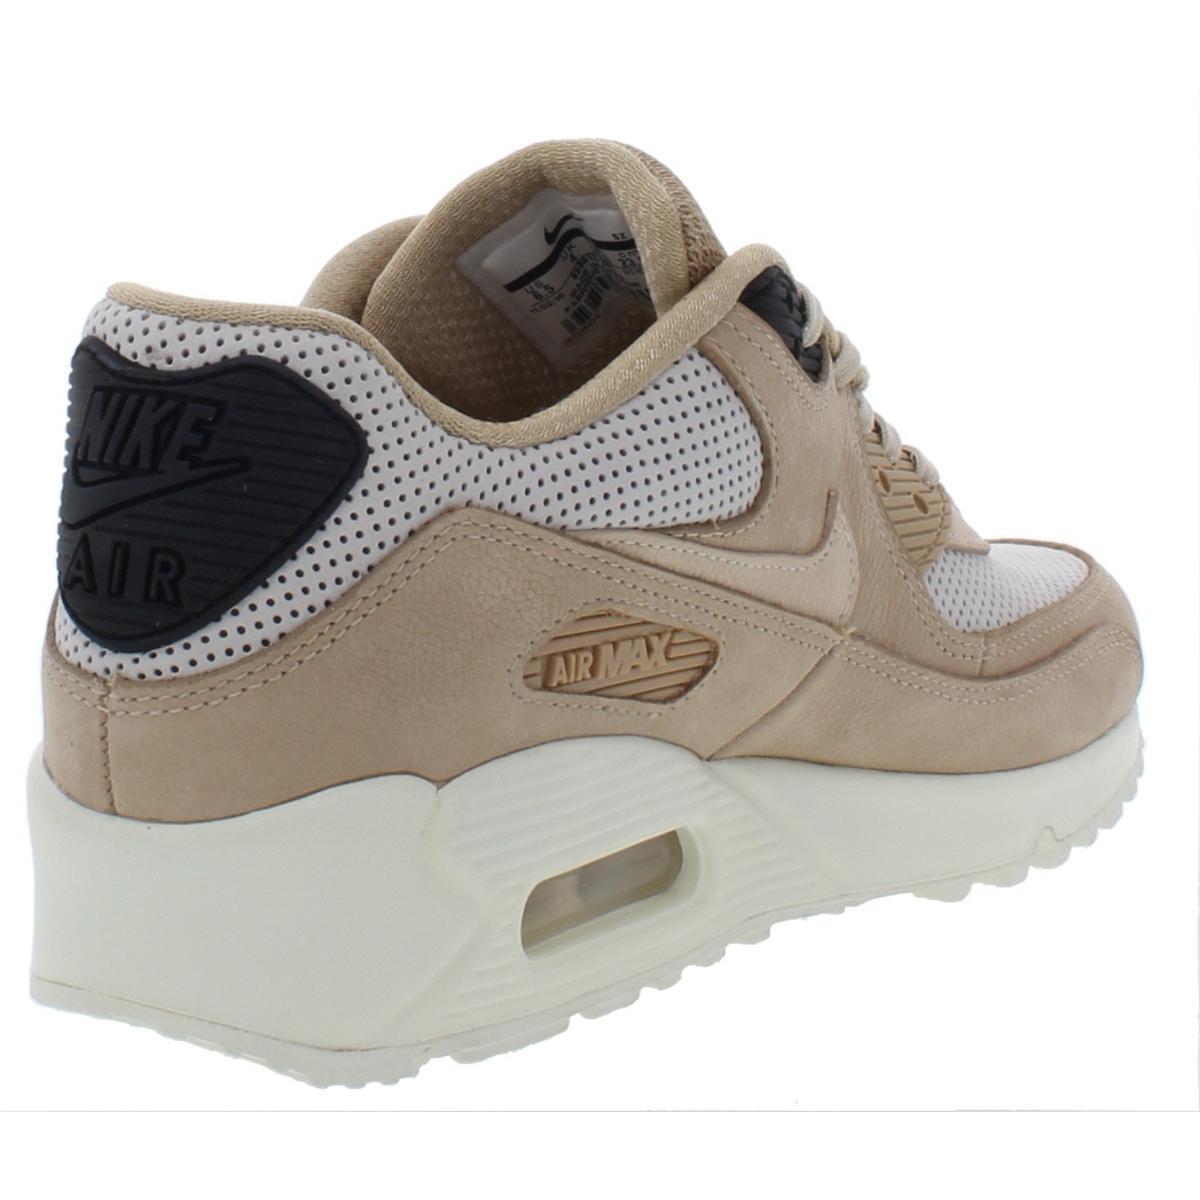 Nike-Womens-Air-Max-90-Pinnacle-Suede-Low-Top-Fashion-Sneakers-Shoes-BHFO-4140 thumbnail 8